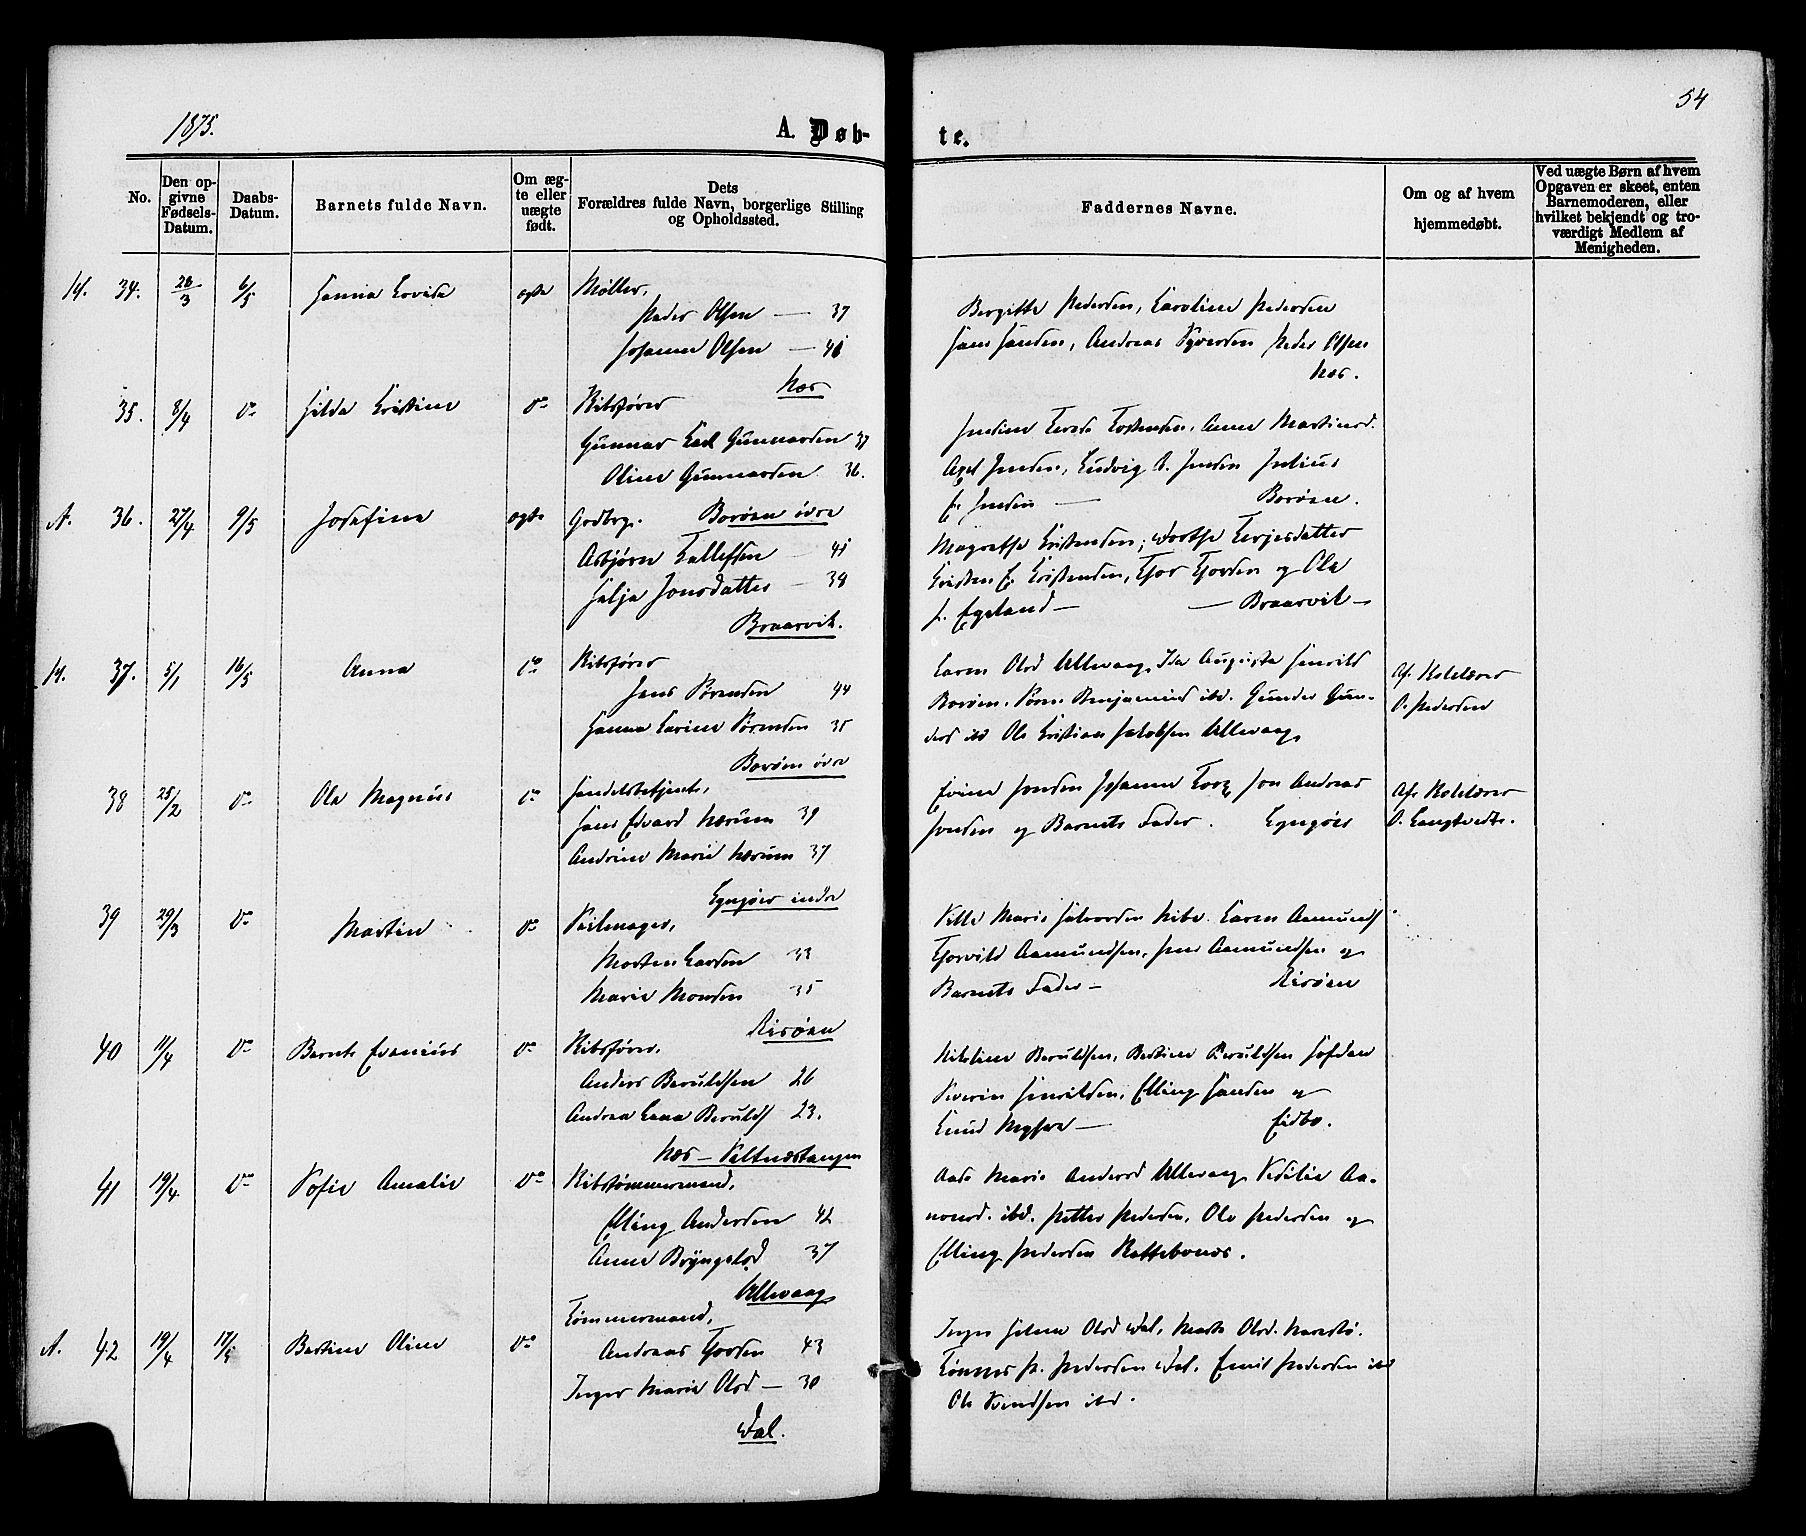 SAK, Dypvåg sokneprestkontor, F/Fa/Faa/L0007: Ministerialbok nr. A 7/ 1, 1872-1884, s. 54